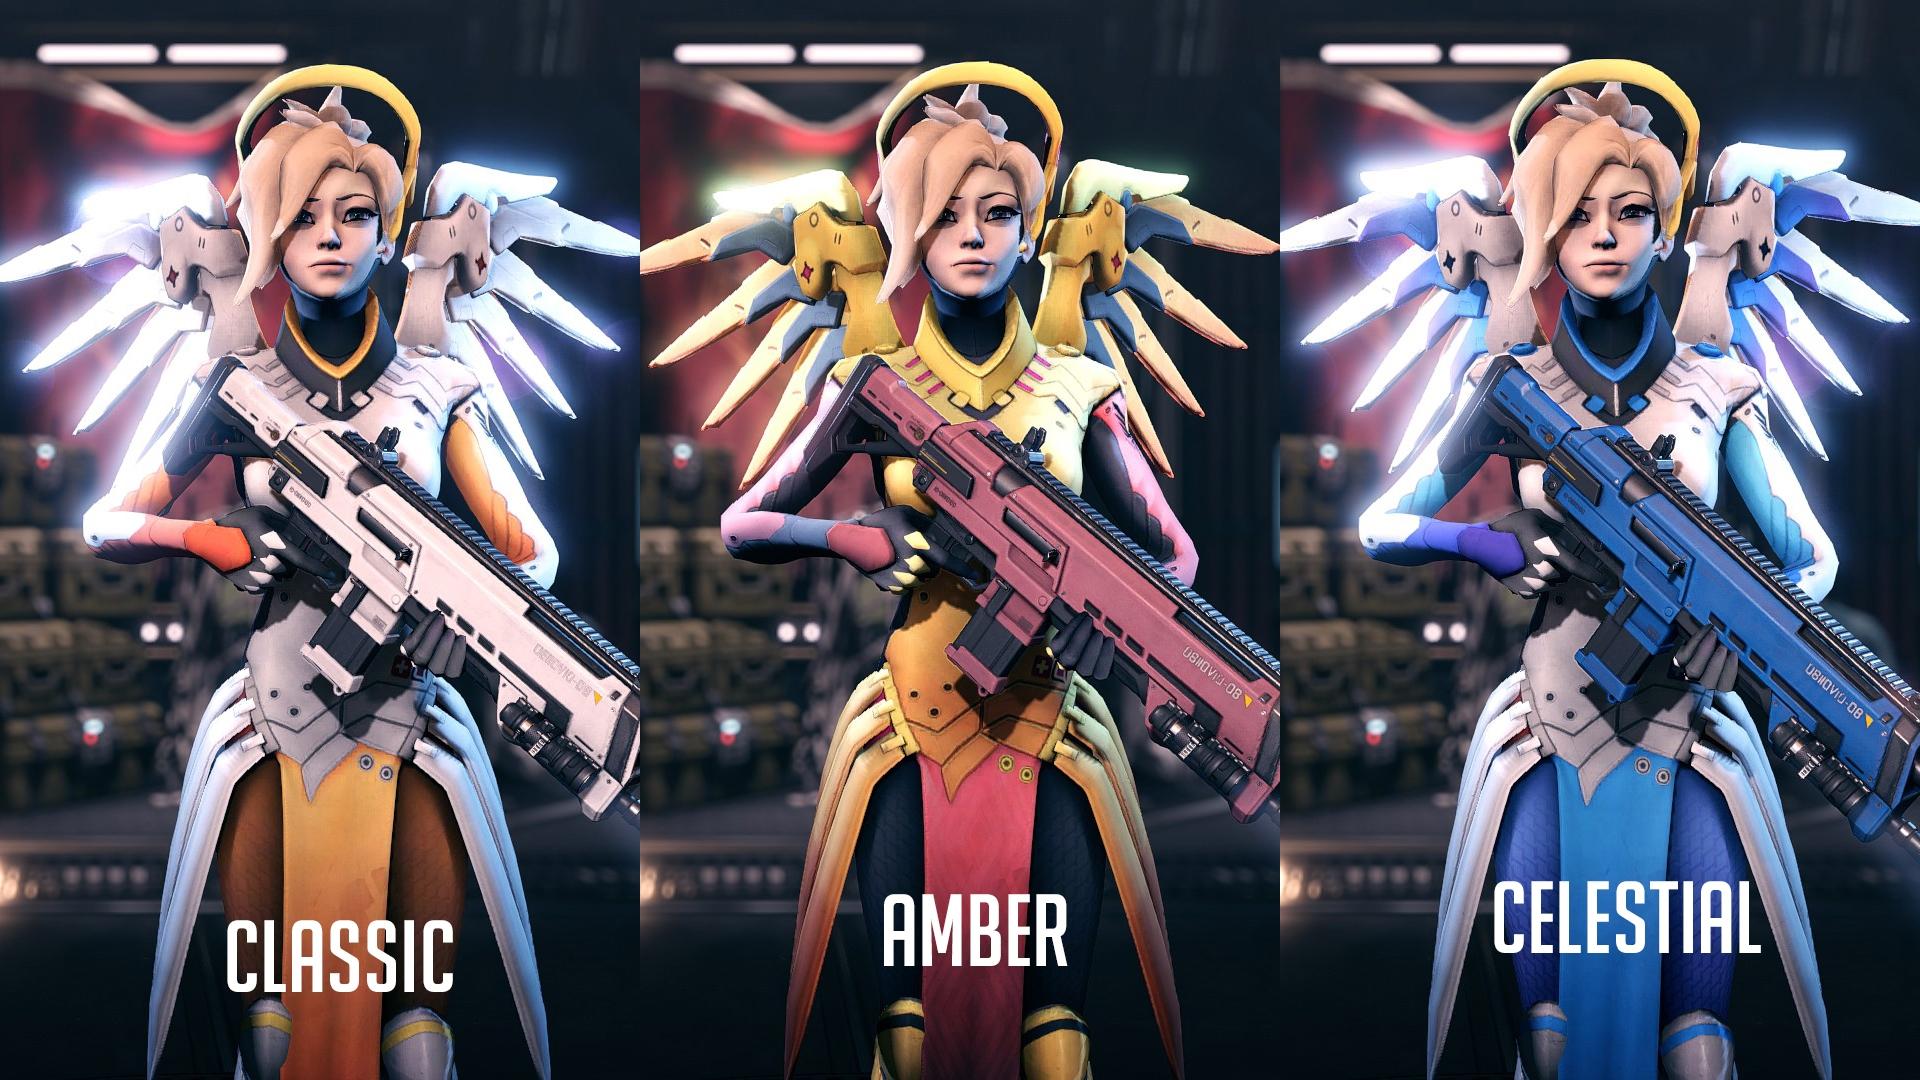 xcom 2 war of the chosen mod brings overwatch s lifesaver mercy